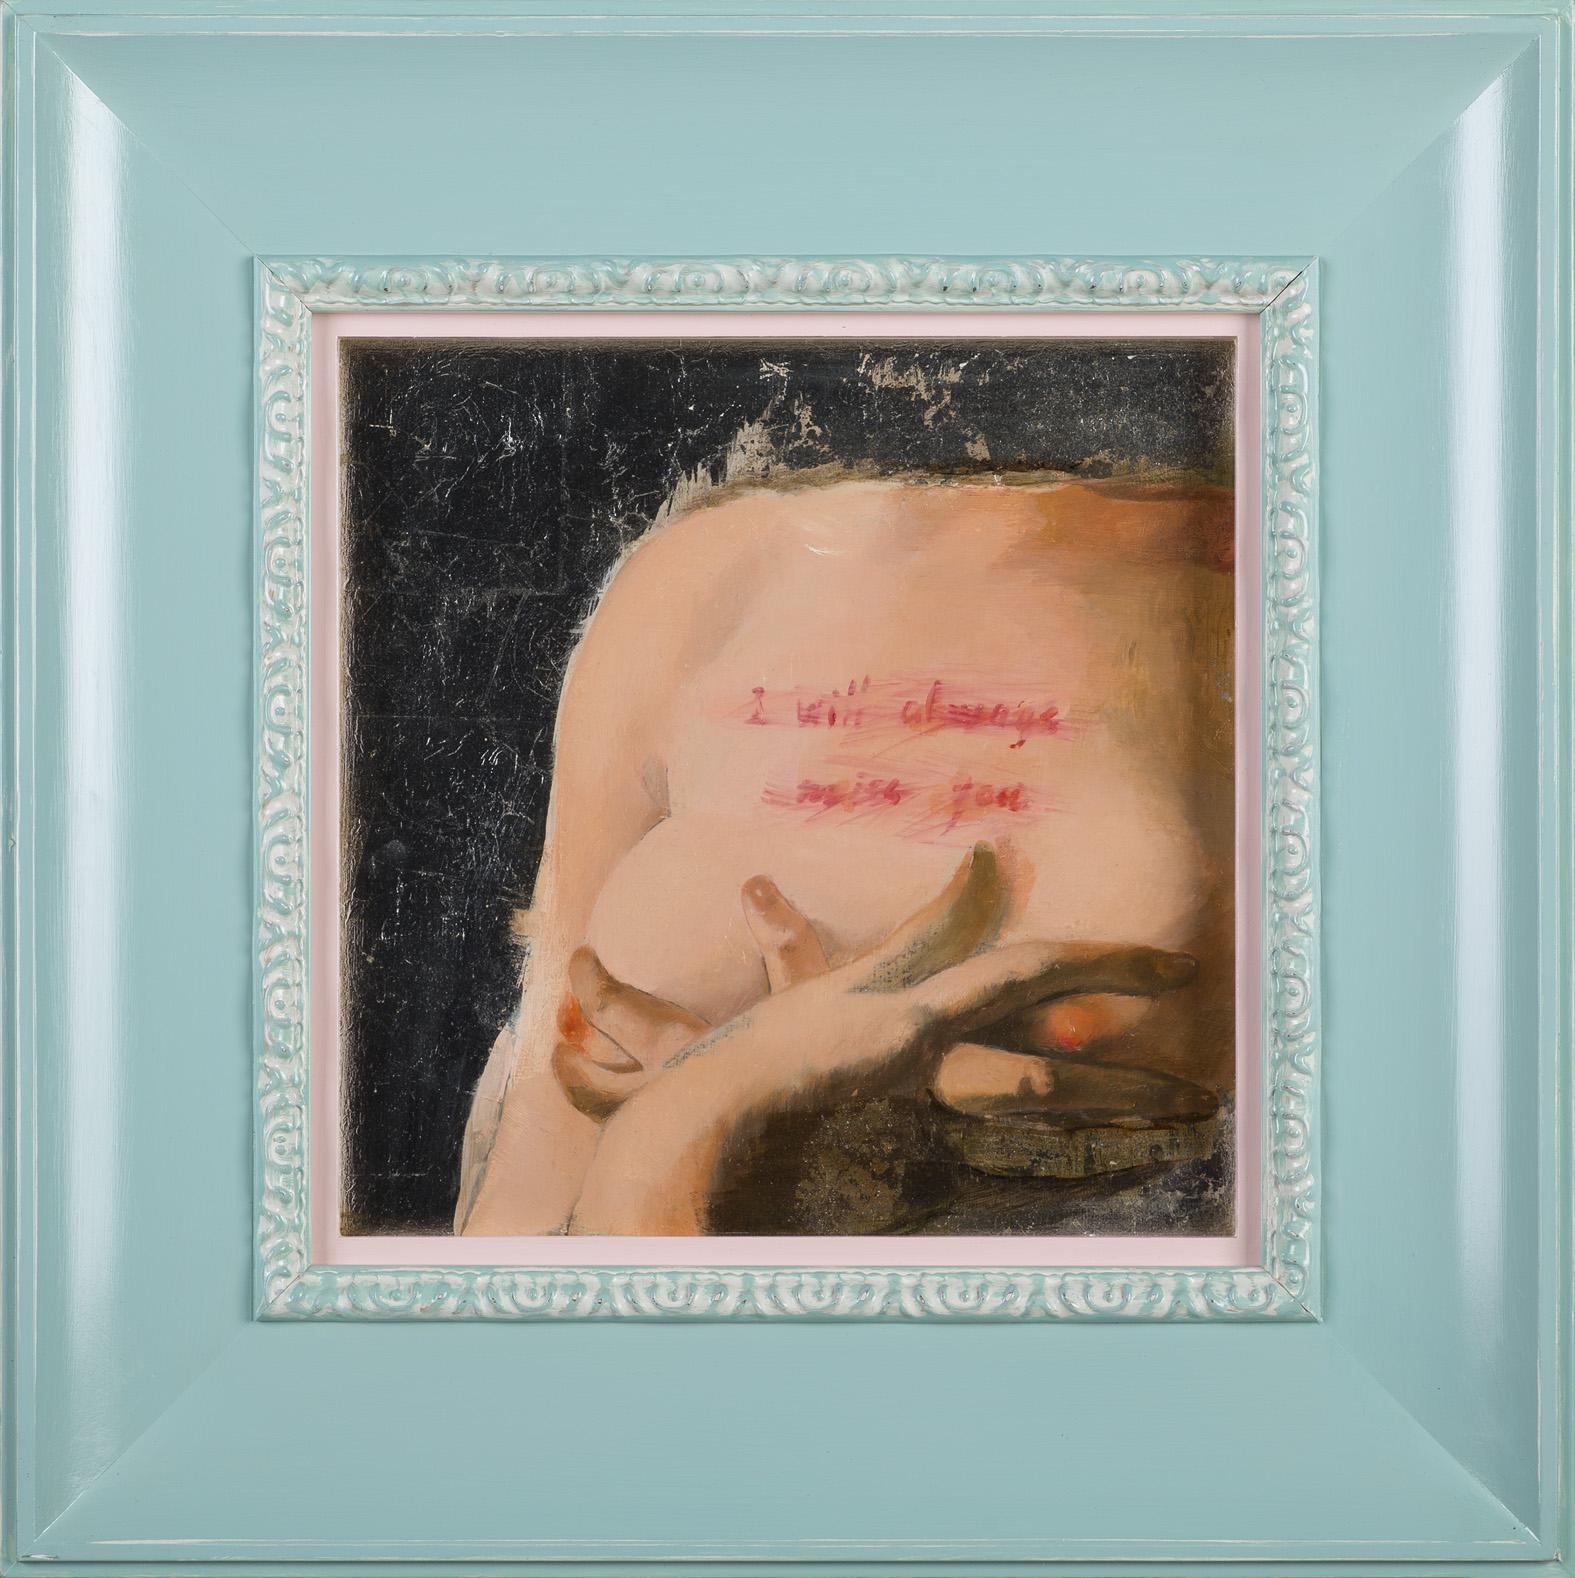 Wu Di 吴笛, 巴不洛克, 2014, Oil on board and gold foil 木板油画、金箔, 30 x 30 cm